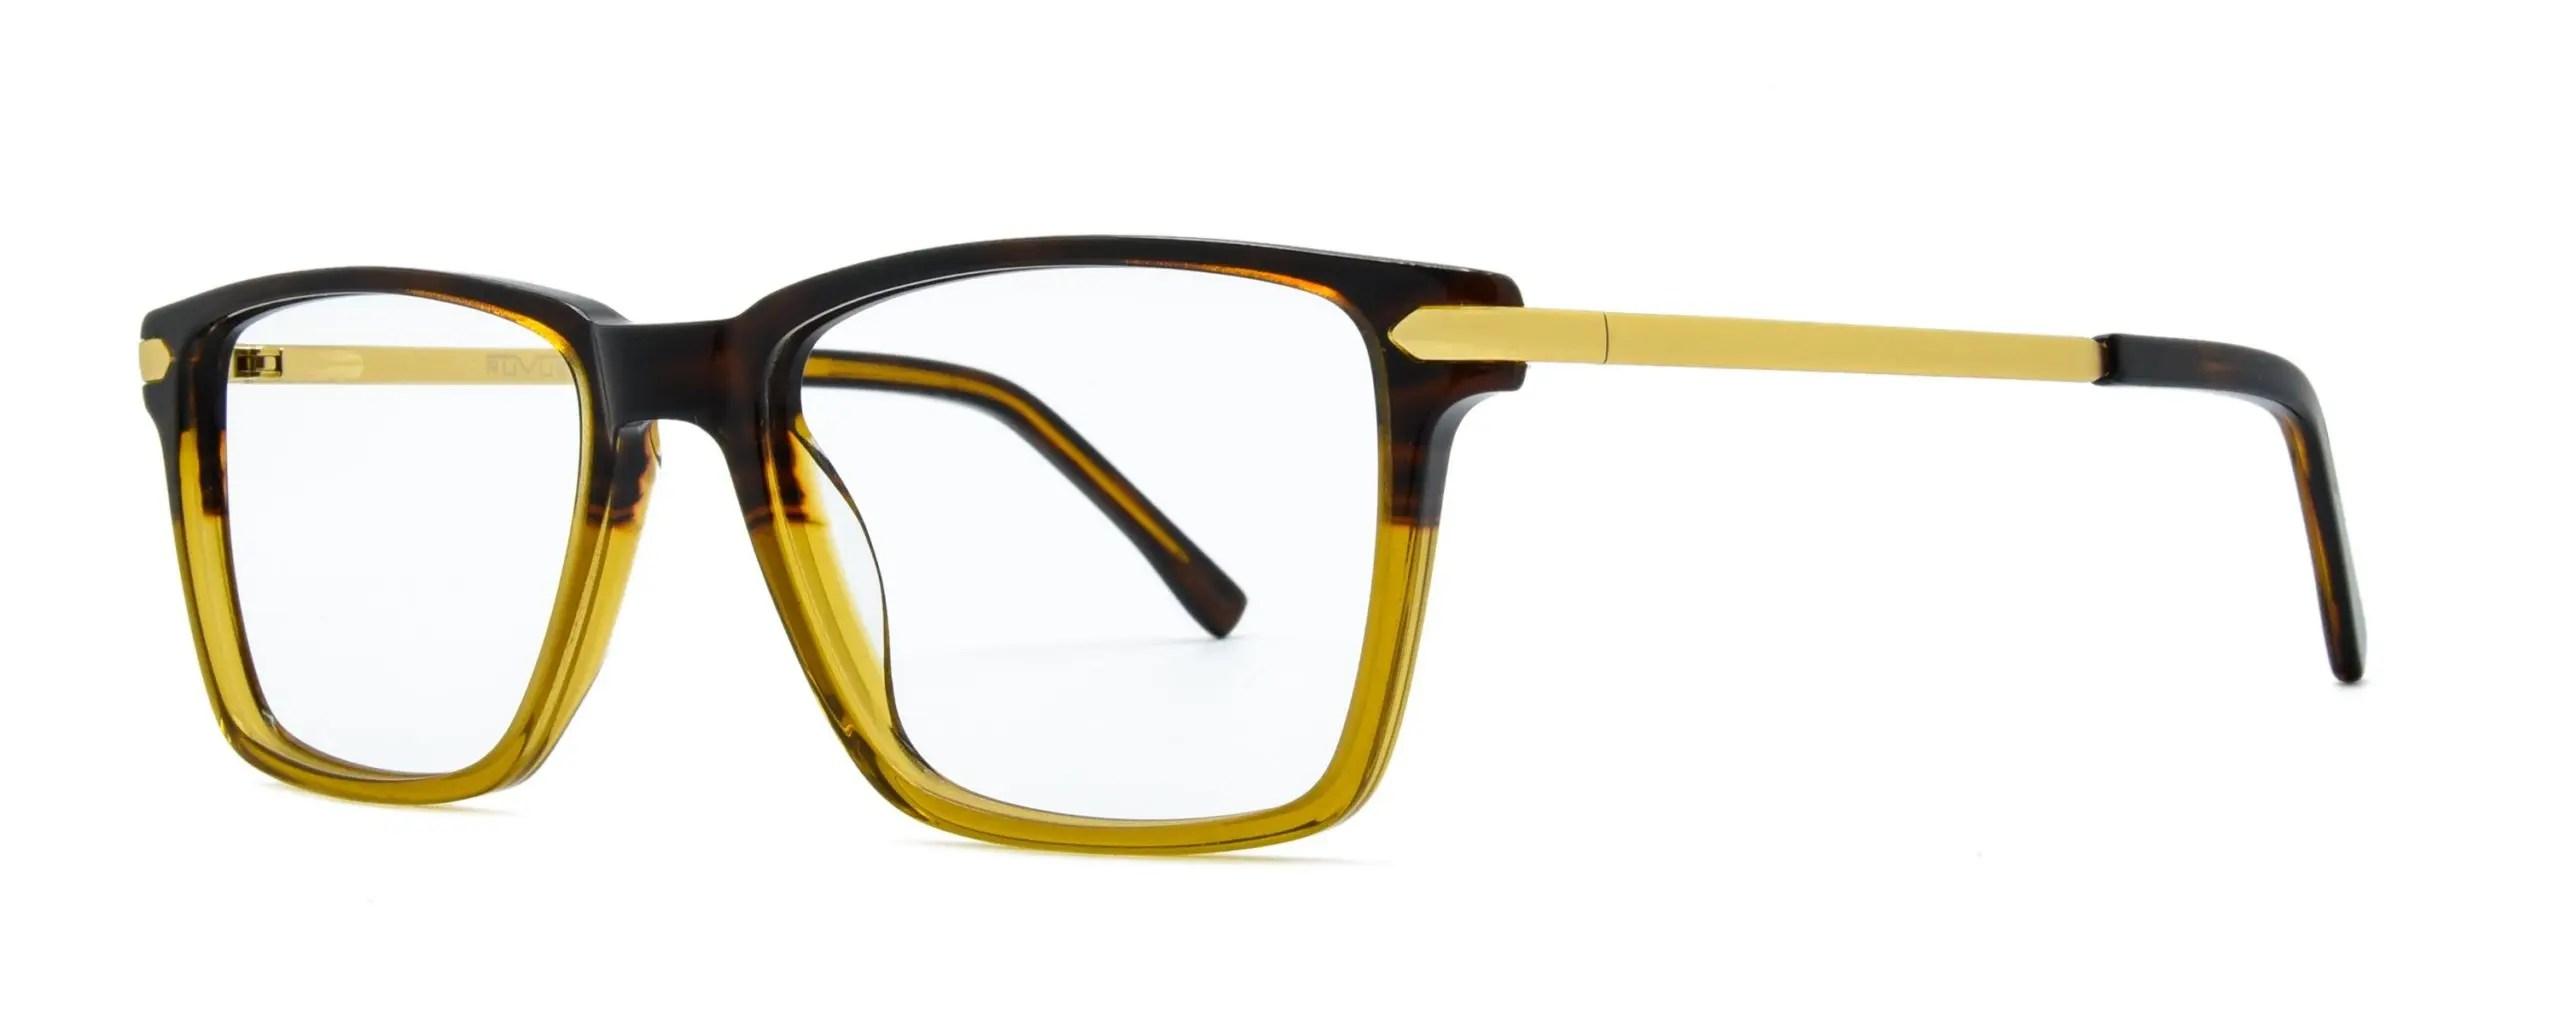 Thaddeus - Brown Stripe Gold - Angle